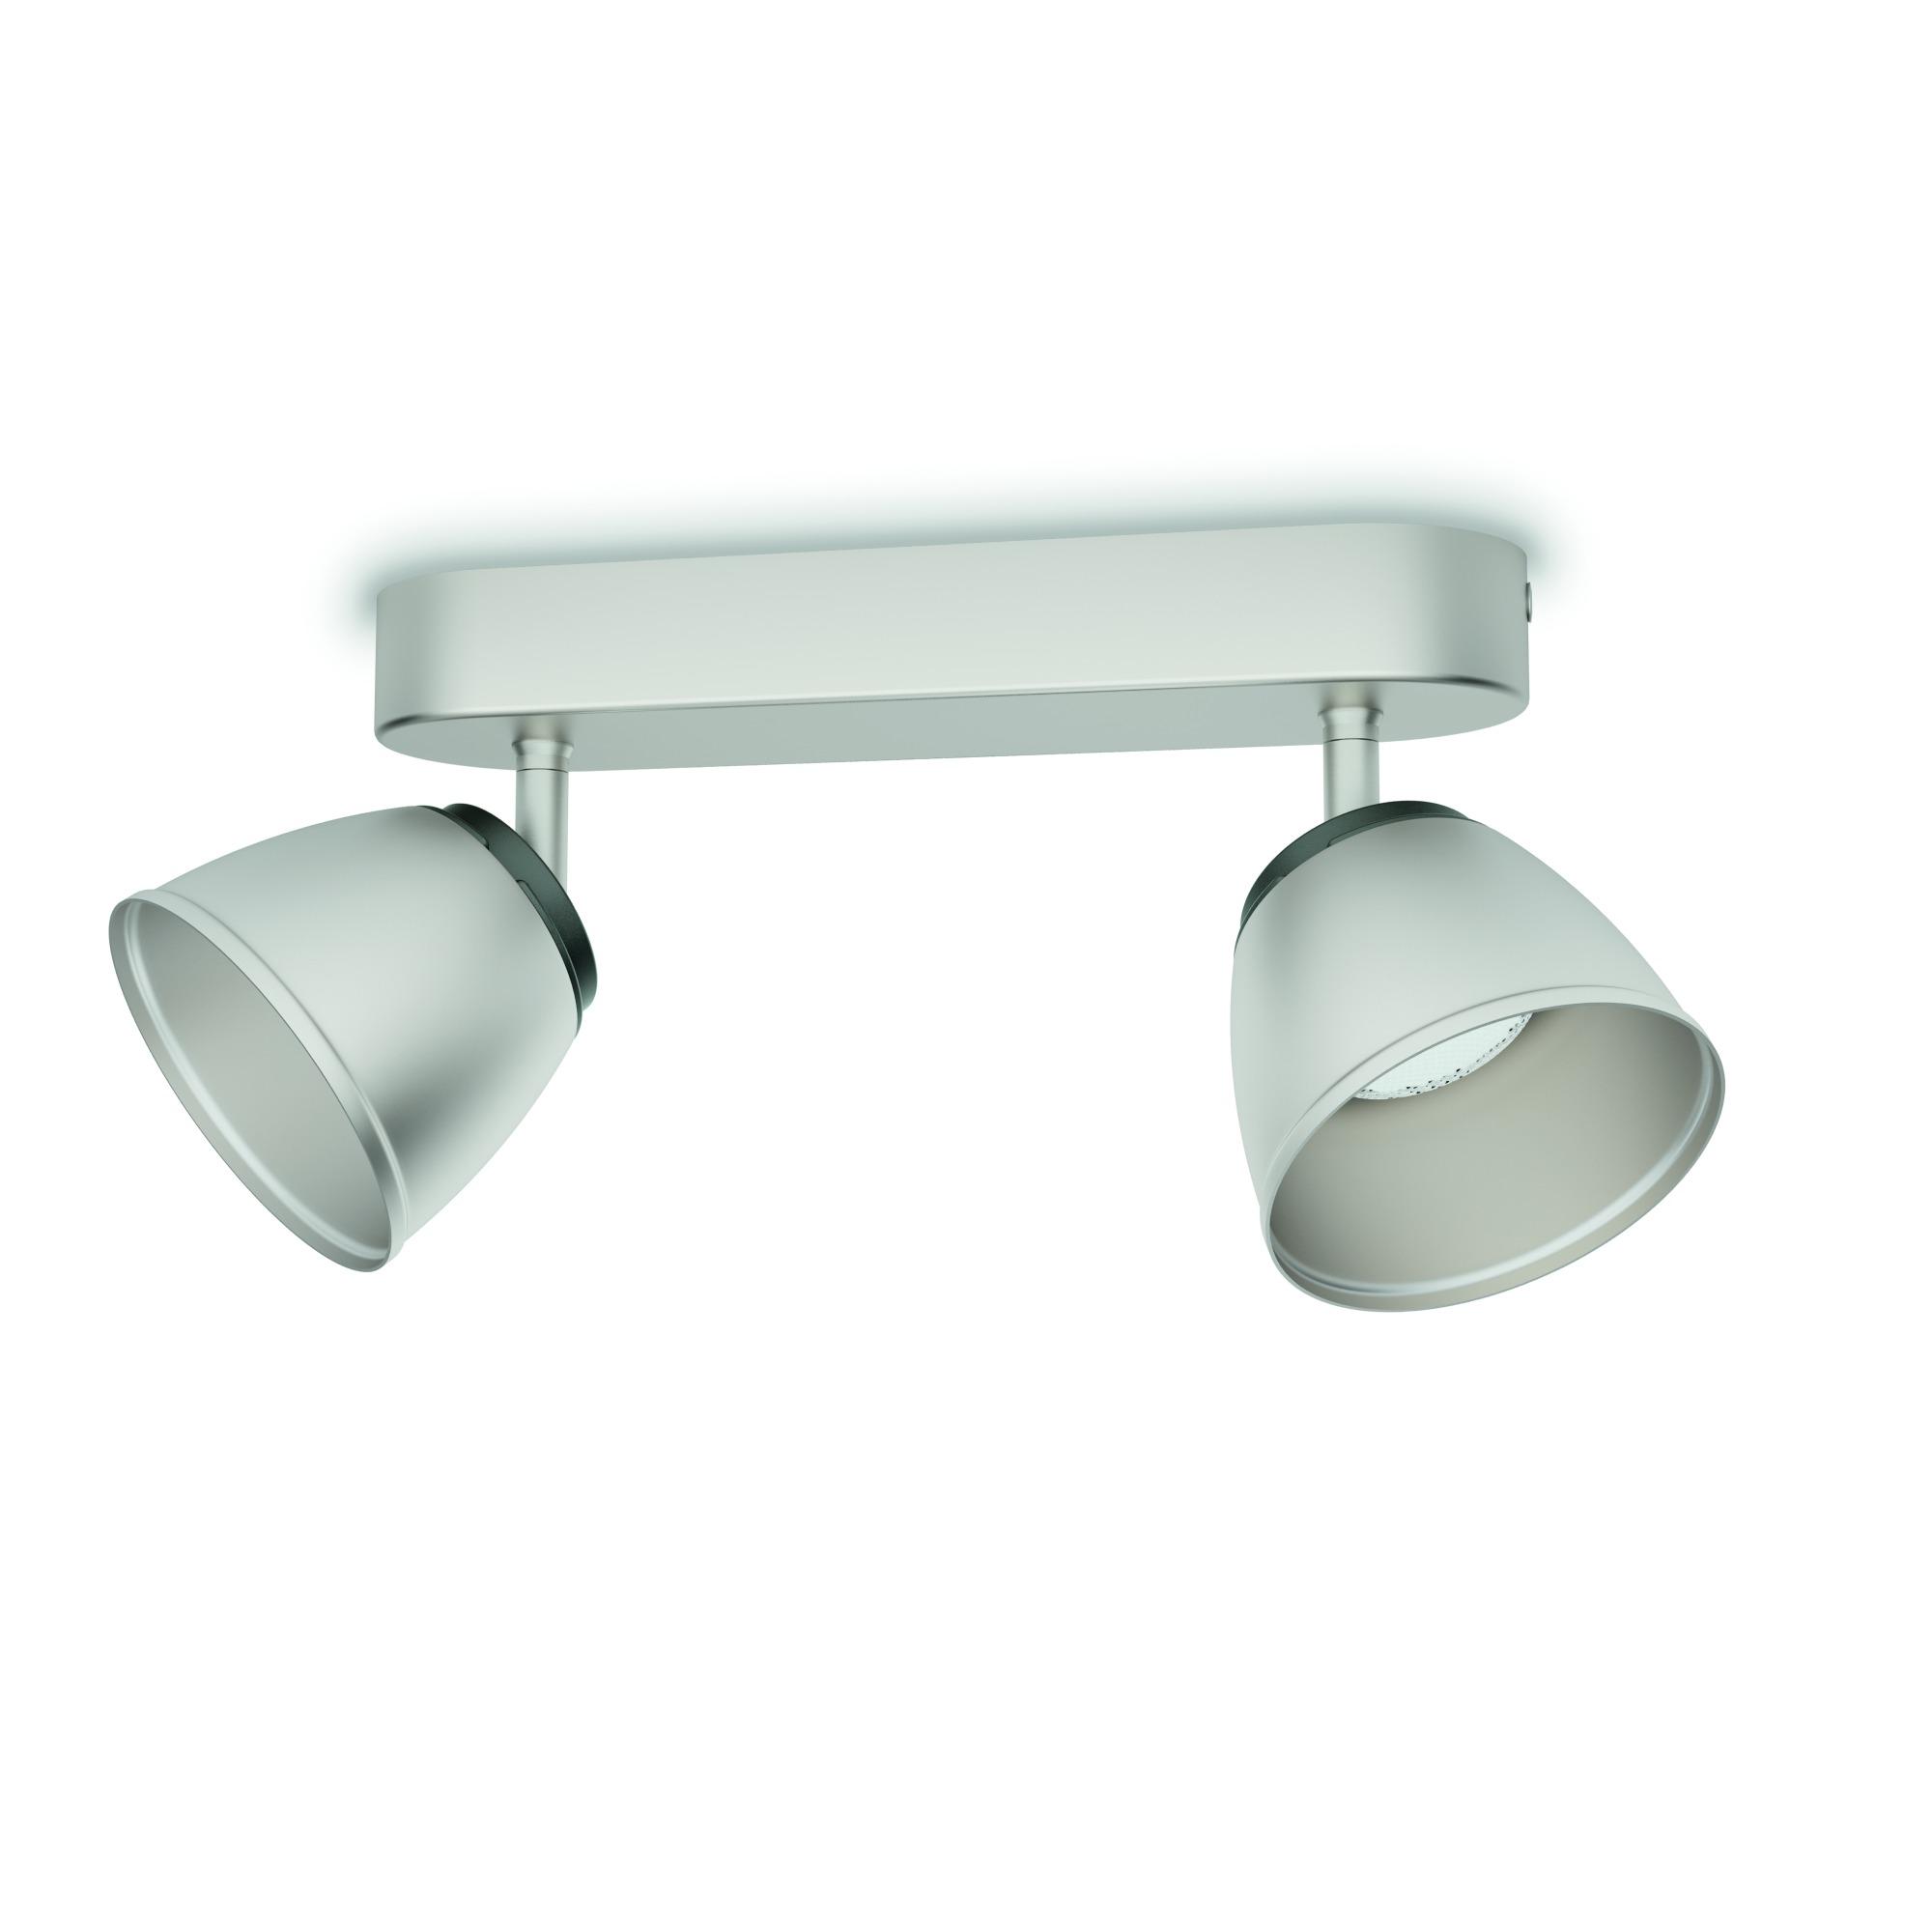 Philips duobalk County LED 2X4W nikkel